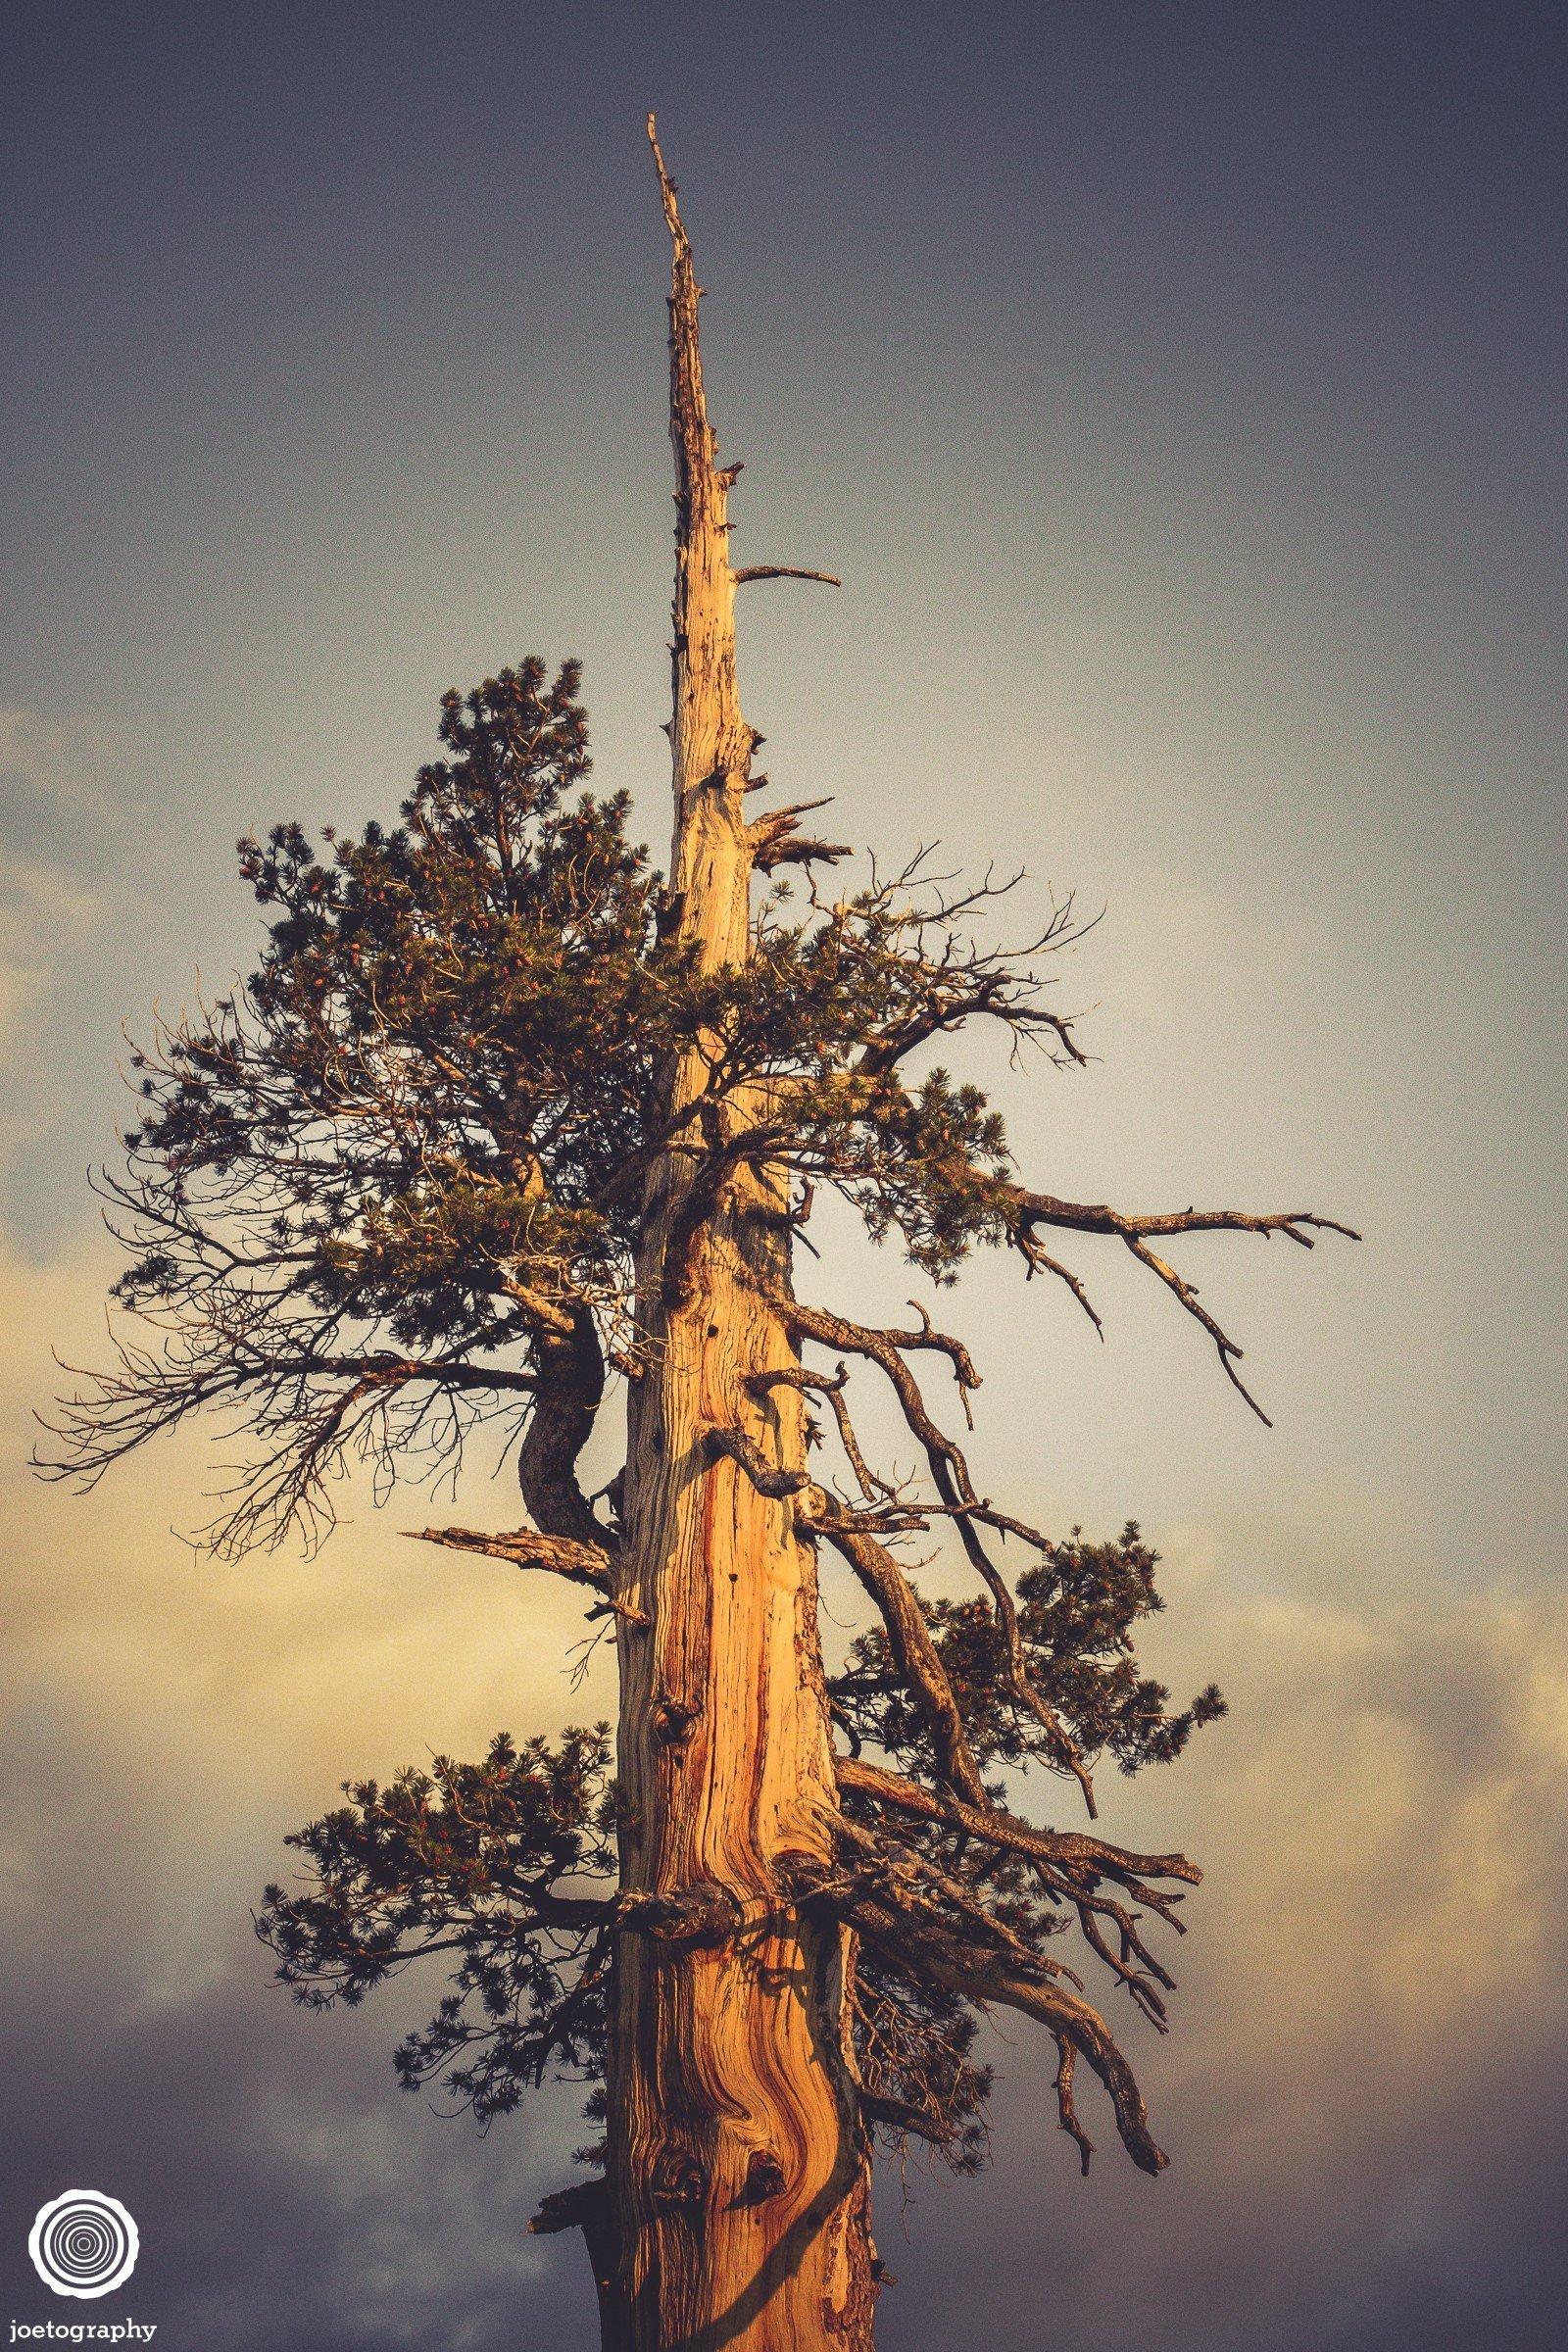 joetography-travel-photography-yosemite-2015-5